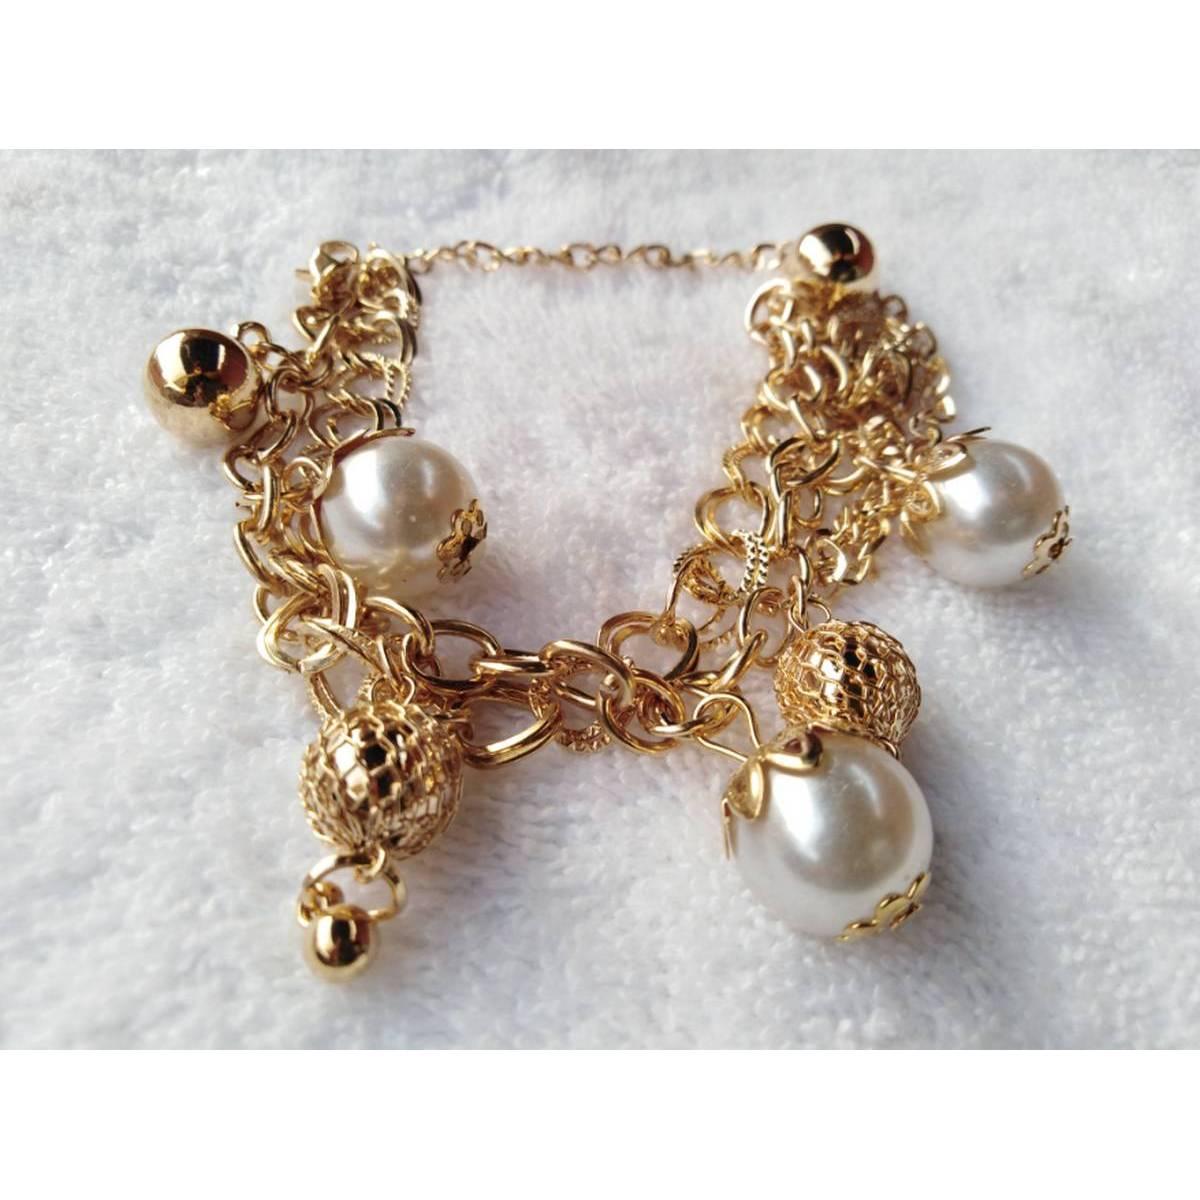 Simple Golden Pearls Bracelet For Girls/Ladies/Women valentine day gift